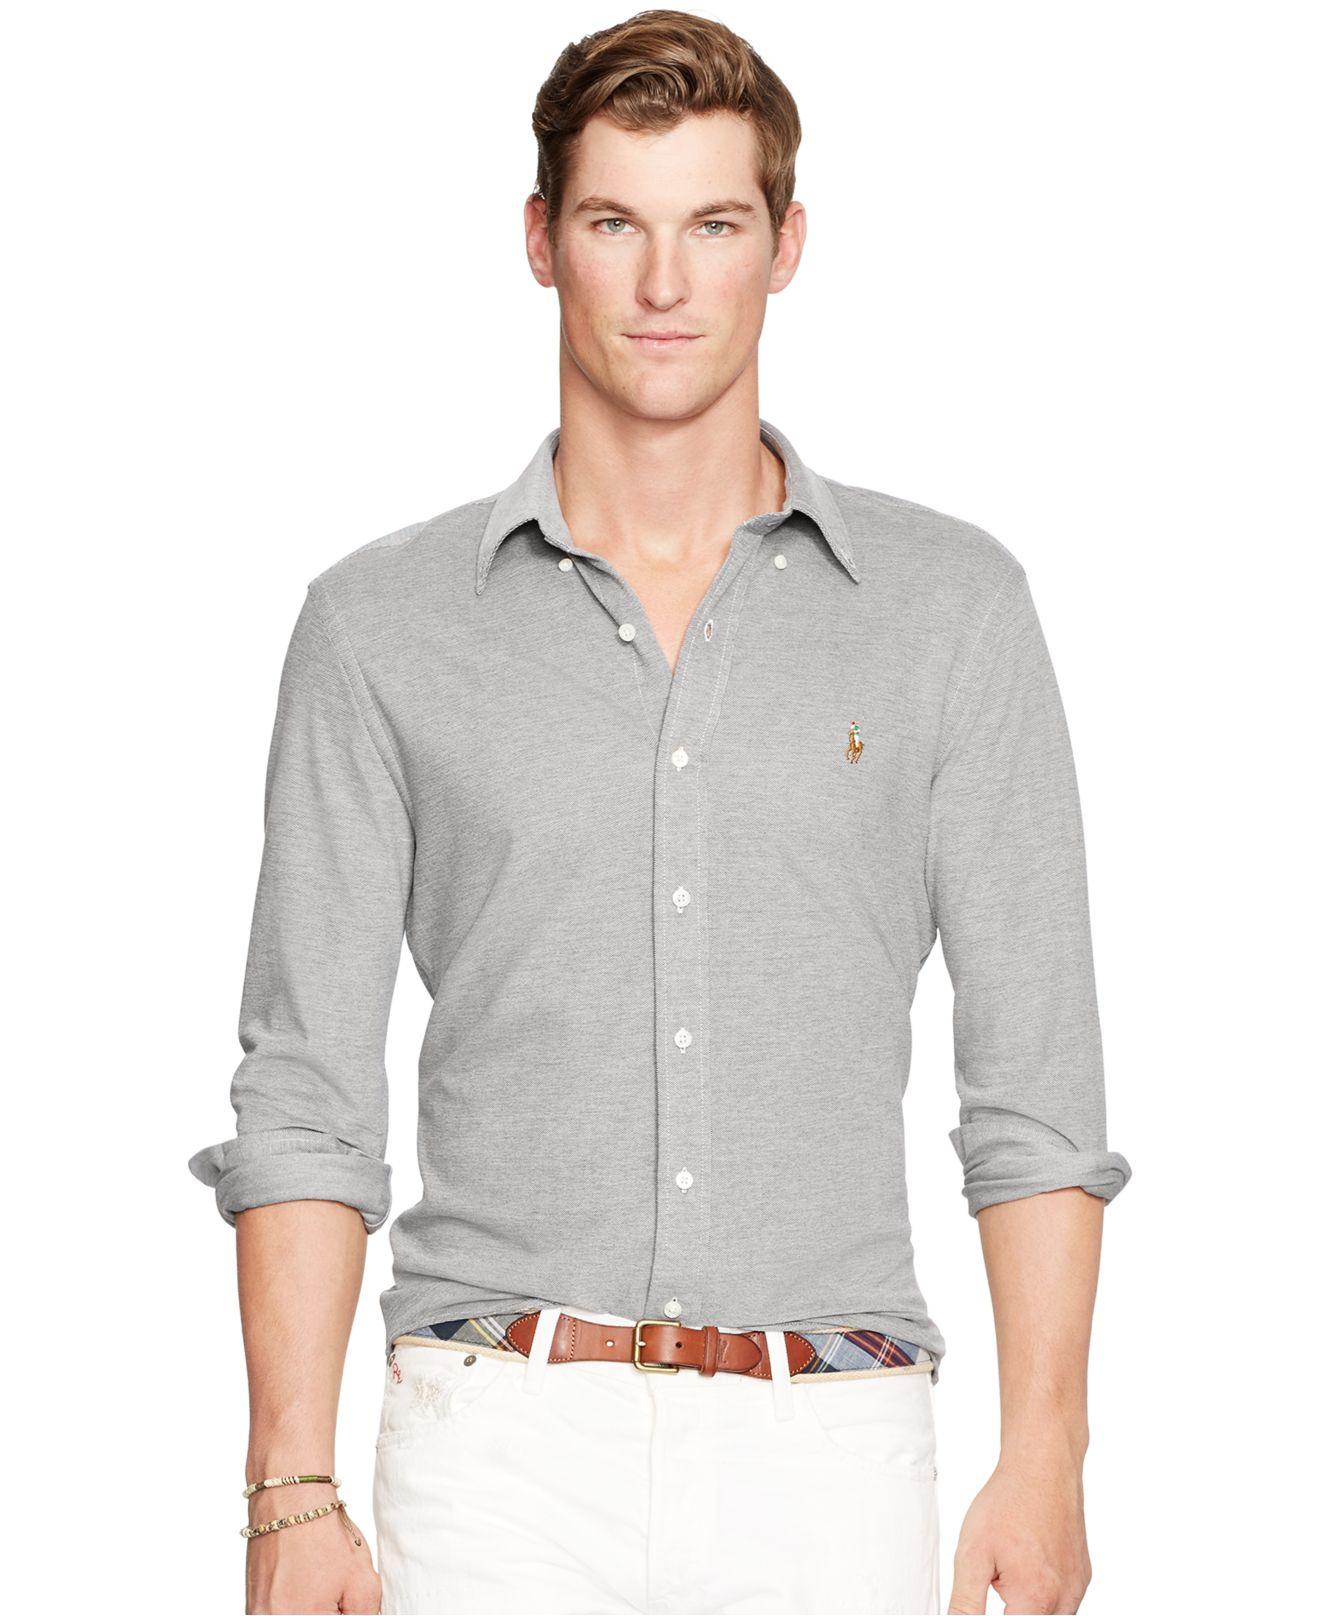 984316f90 Polo Ralph Lauren Knit Oxford Shirt in Black for Men - Lyst